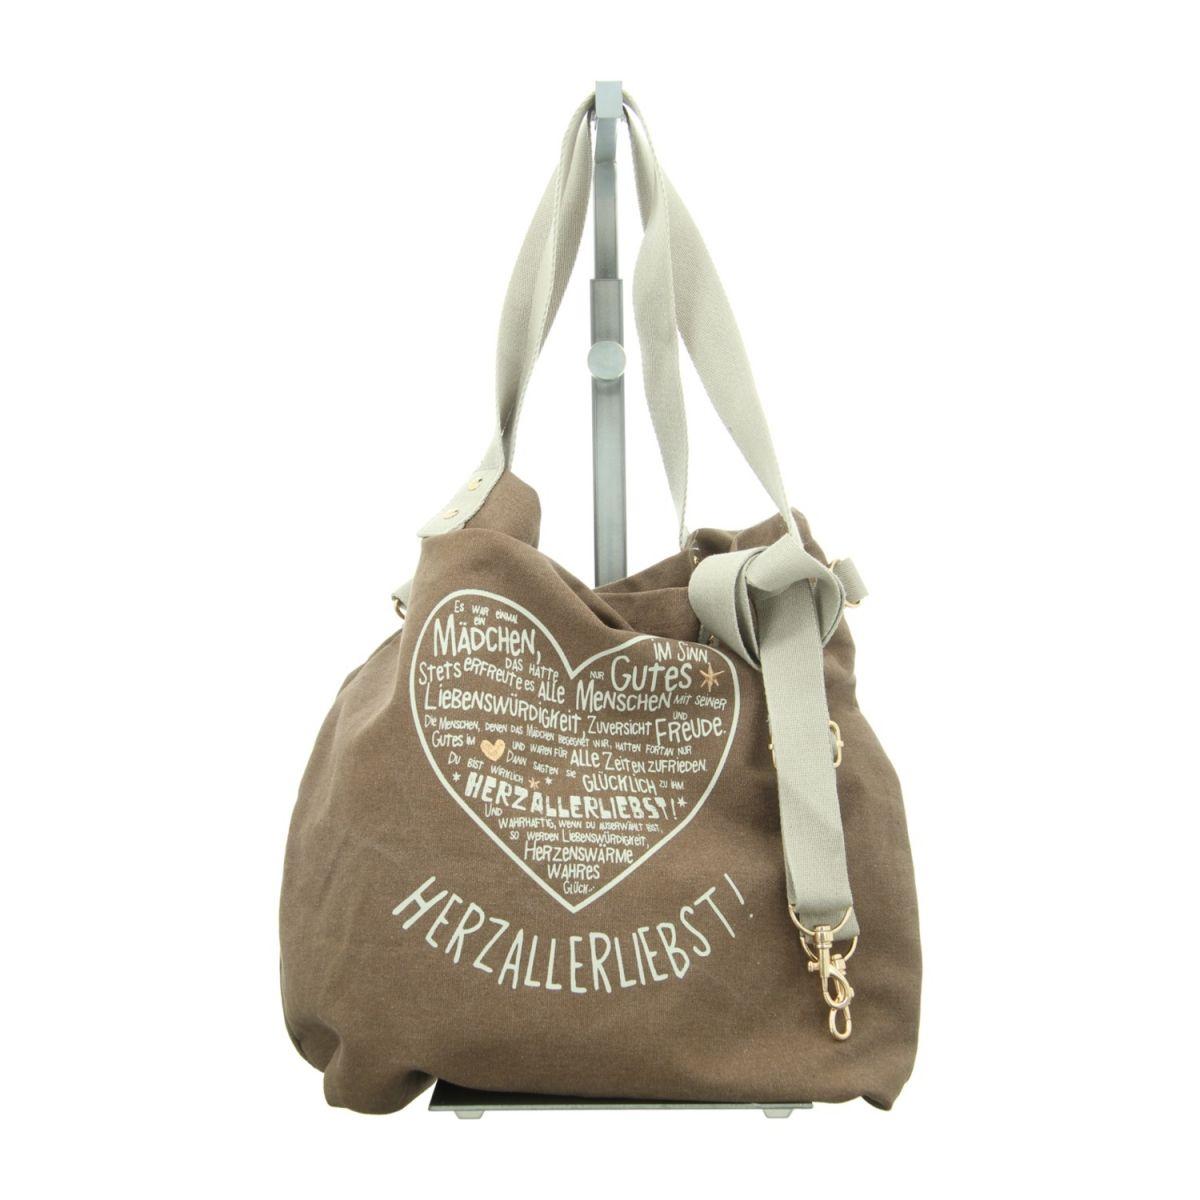 NEU: Adelheid Handtaschen Herzallerliebst - 11260156514-336 - erdgrau -